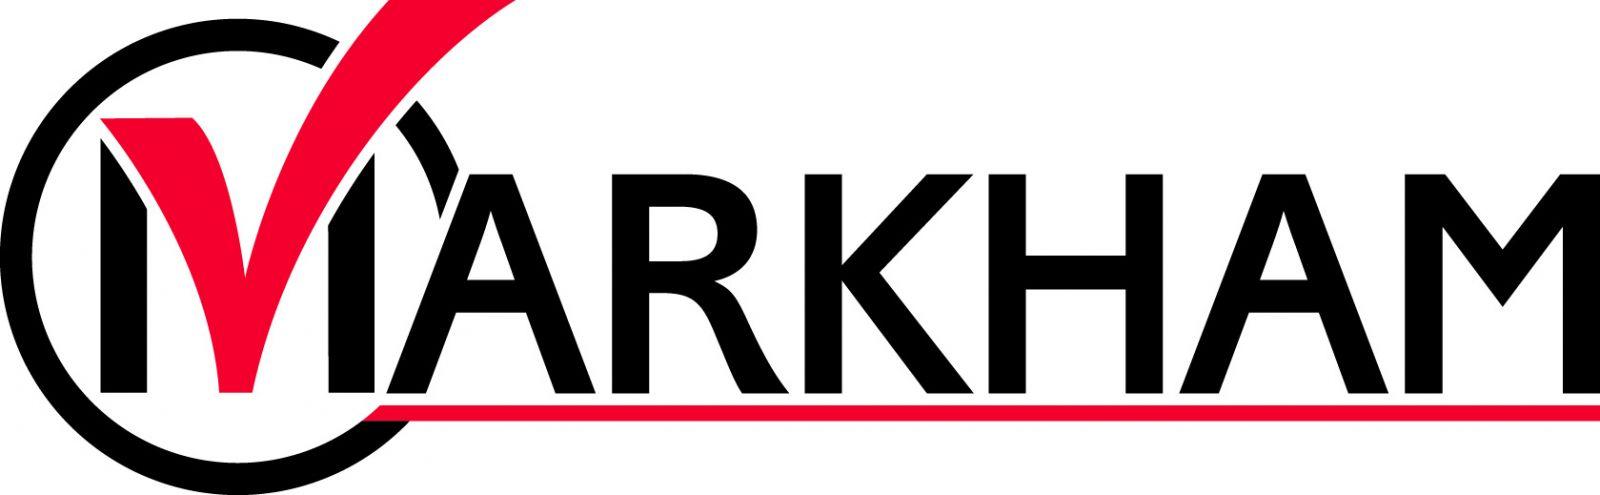 Town of Markham.jpg